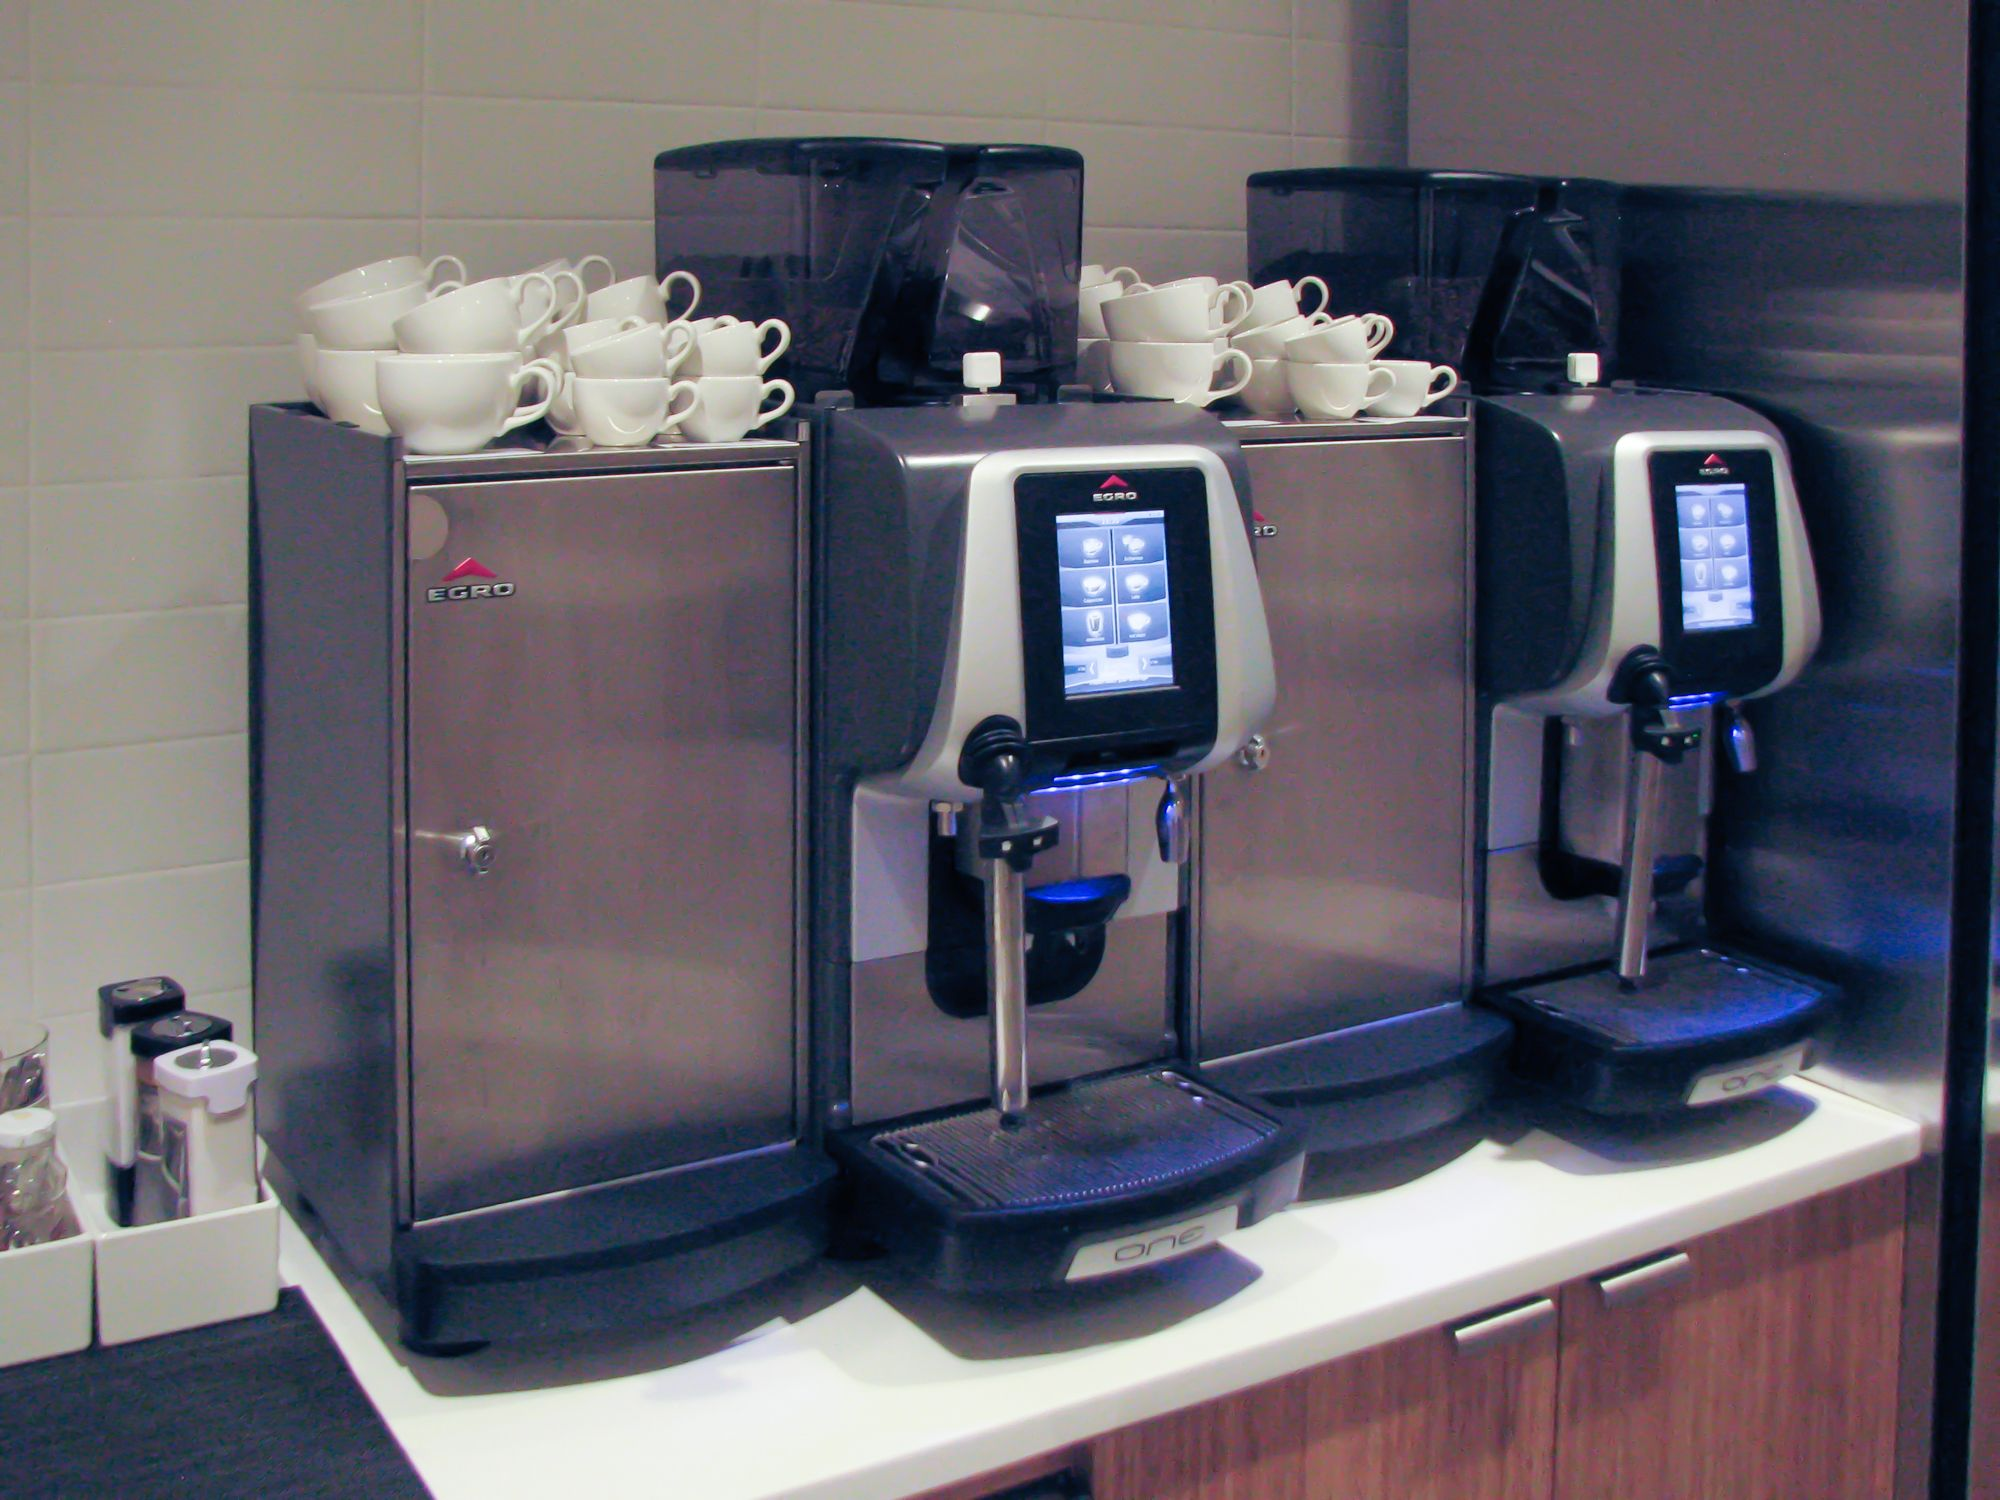 Starbucks Commercial Coffee Machine starbucks coffee machine - google search | cafe concept